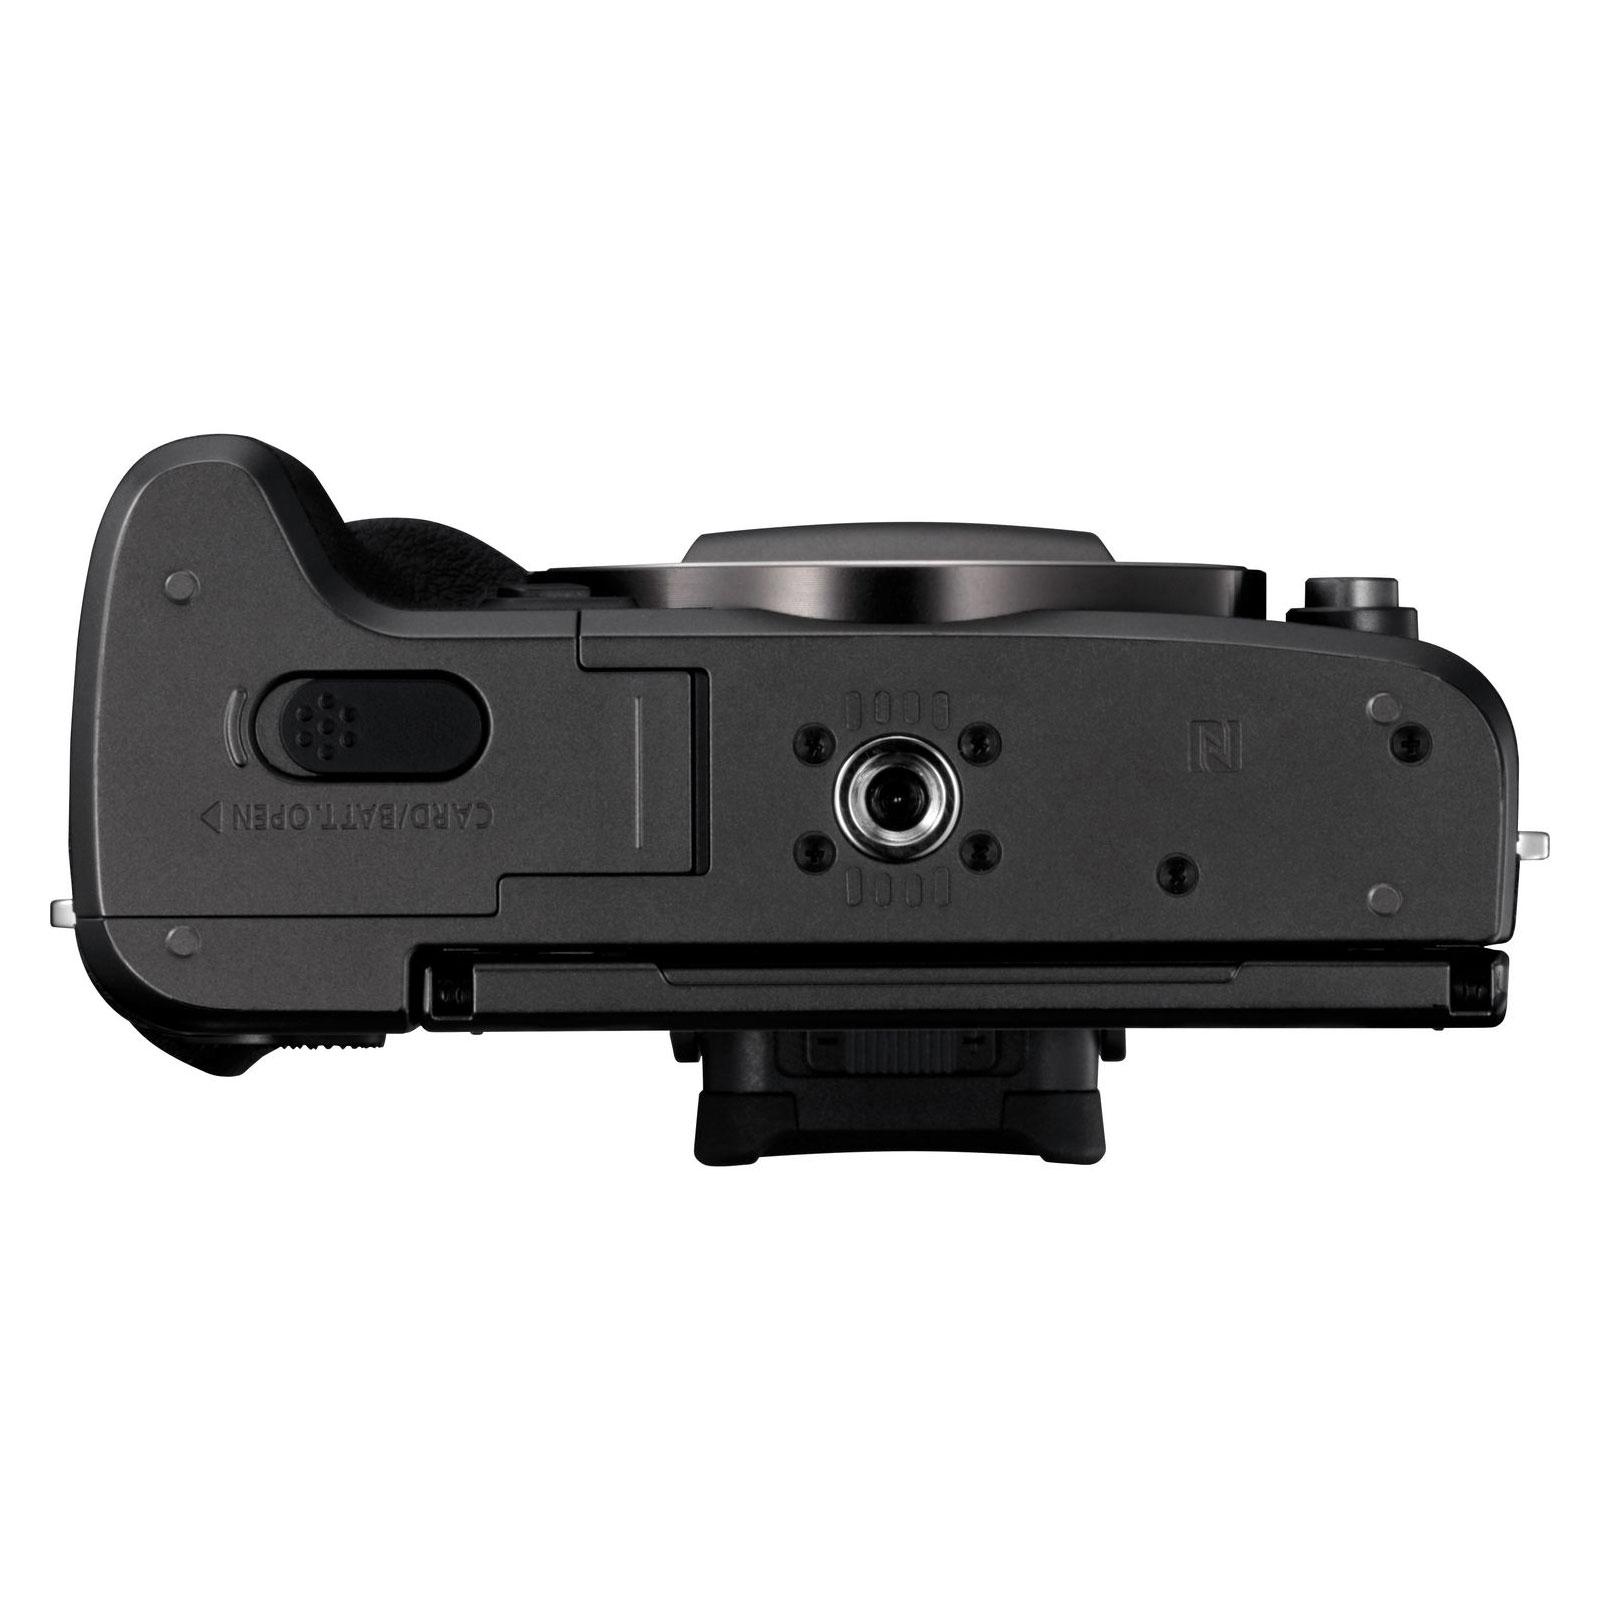 canon eos m5 appareil photo hybride canon sur. Black Bedroom Furniture Sets. Home Design Ideas